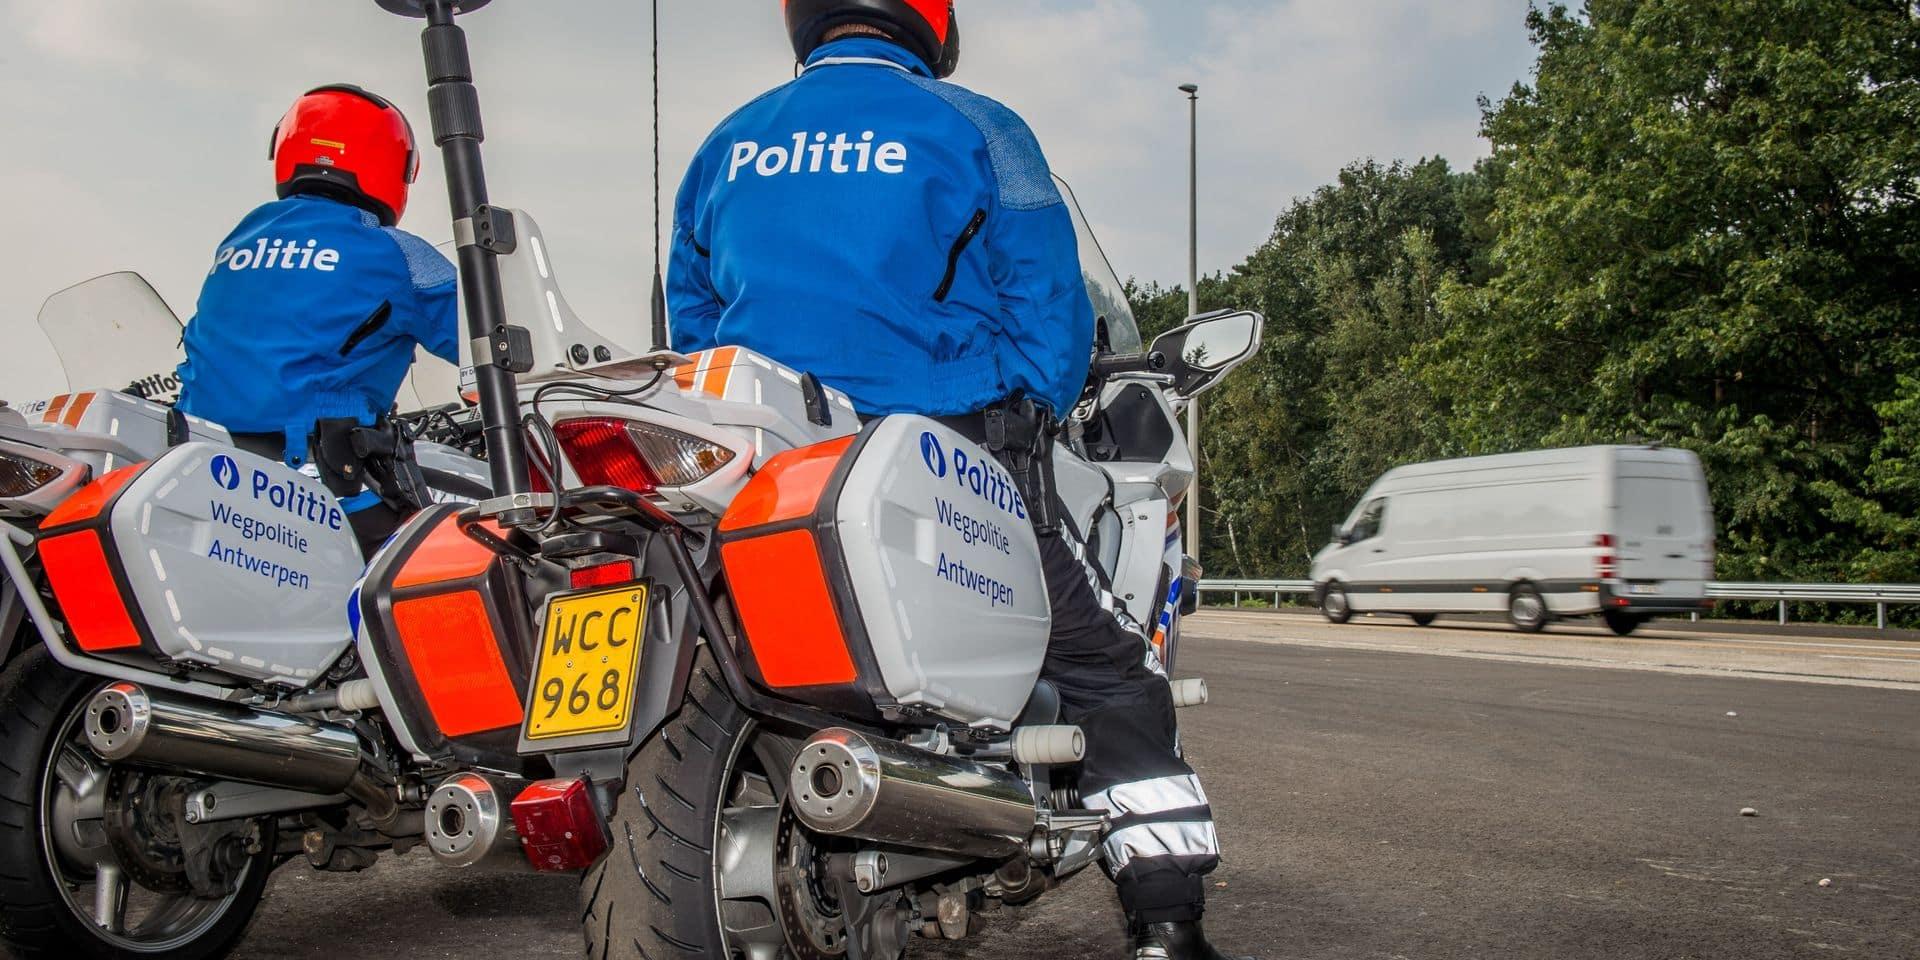 La police organise un nouveau marathon de la vitesse mercredi